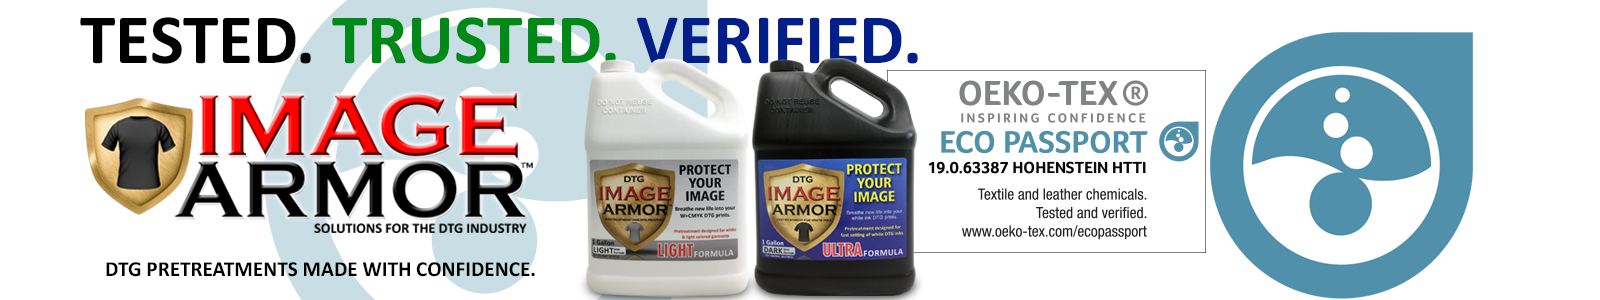 Image Armor DTG Pretreatments Oeko-Tex Certified